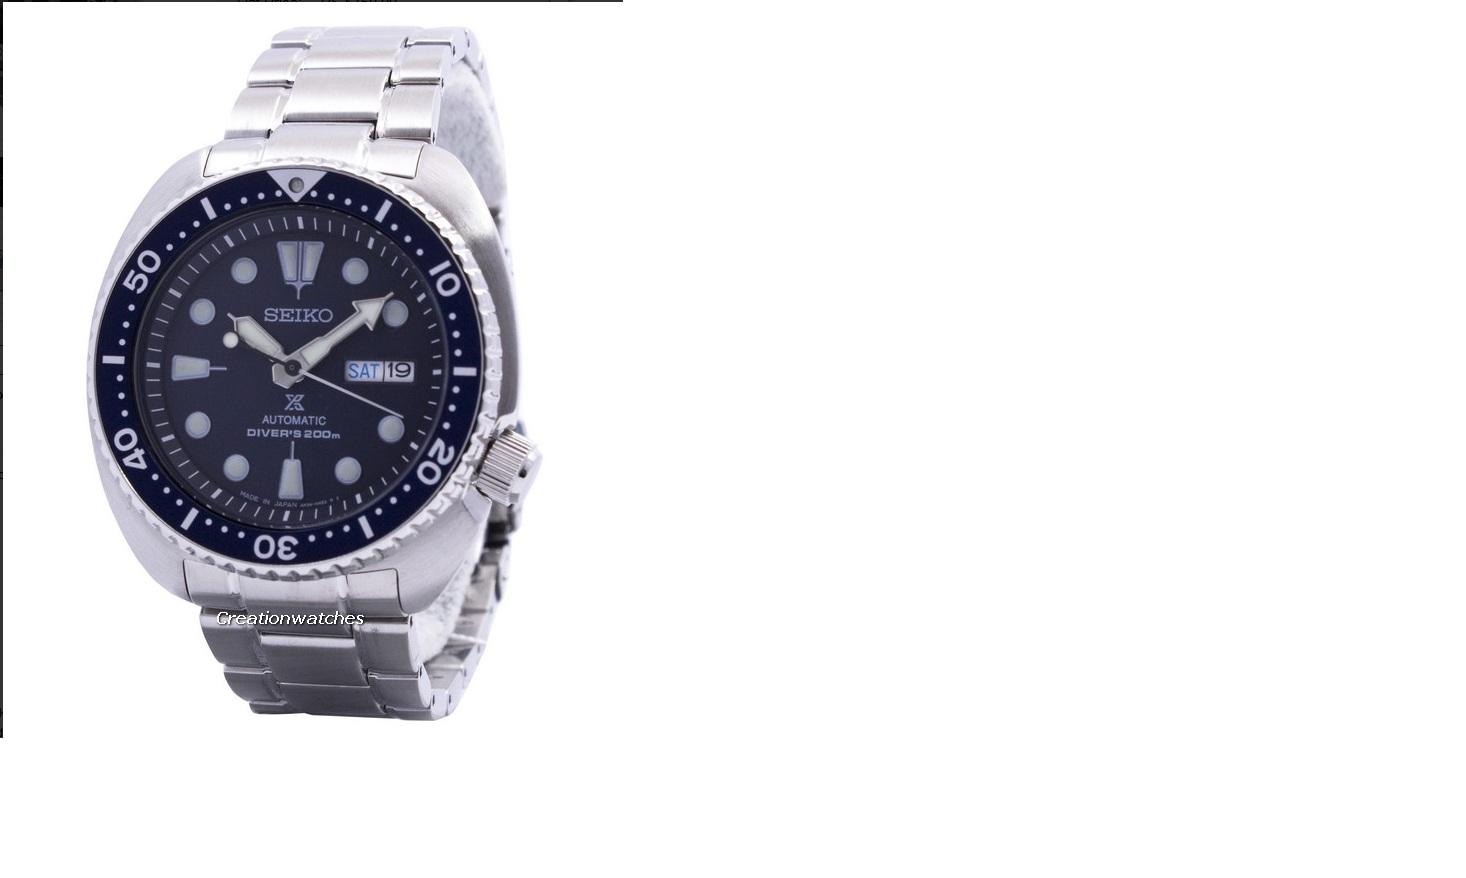 Kupovina SEIKO satova preko Creation Watches.com i Sky Watches.com.sg sajtova- DA ili NE - Strana 6